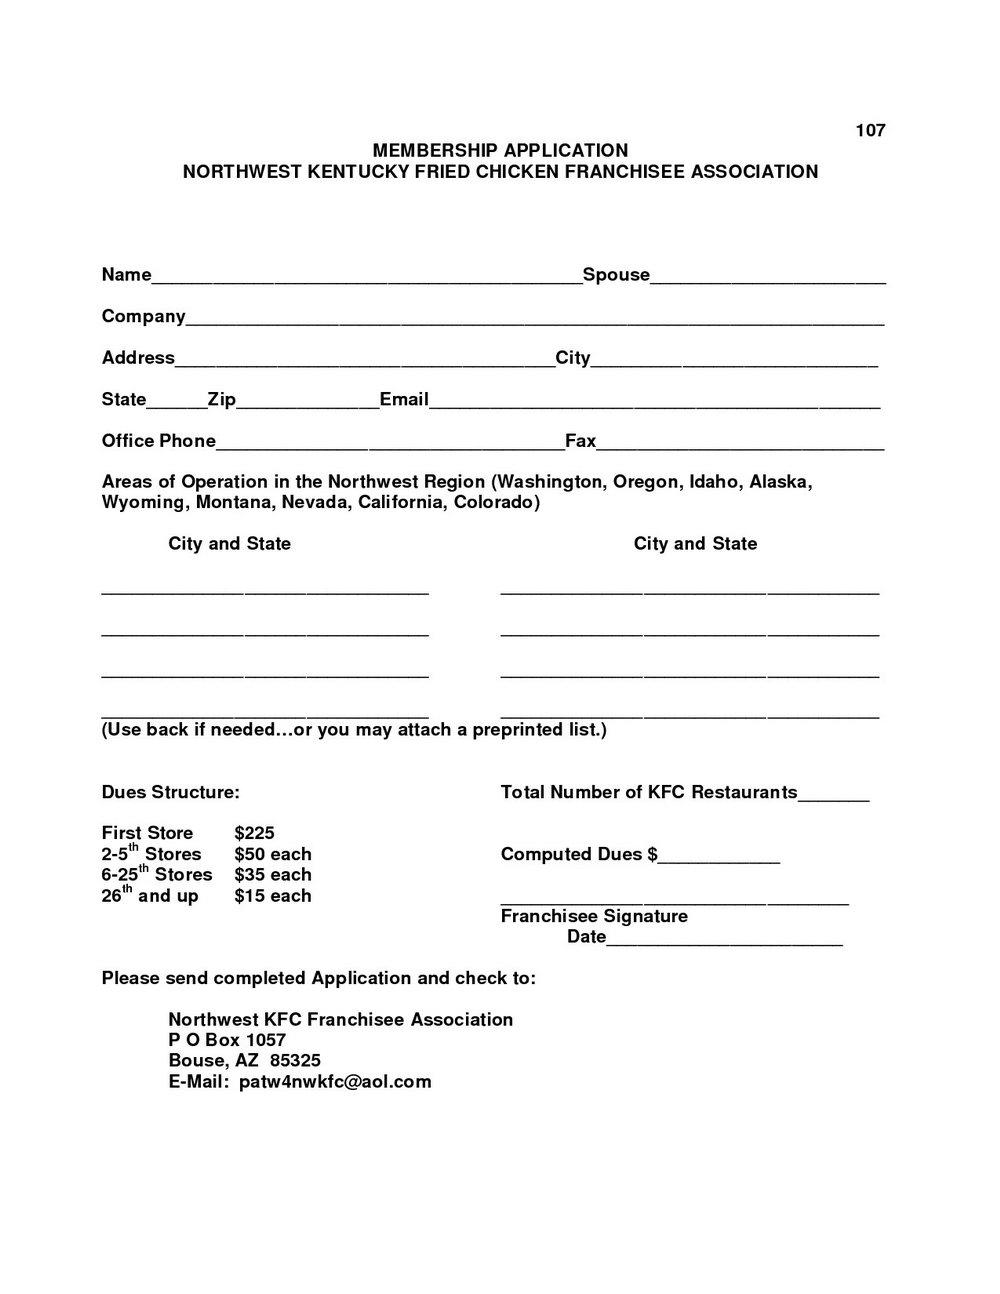 Pacific Bmw Job Application